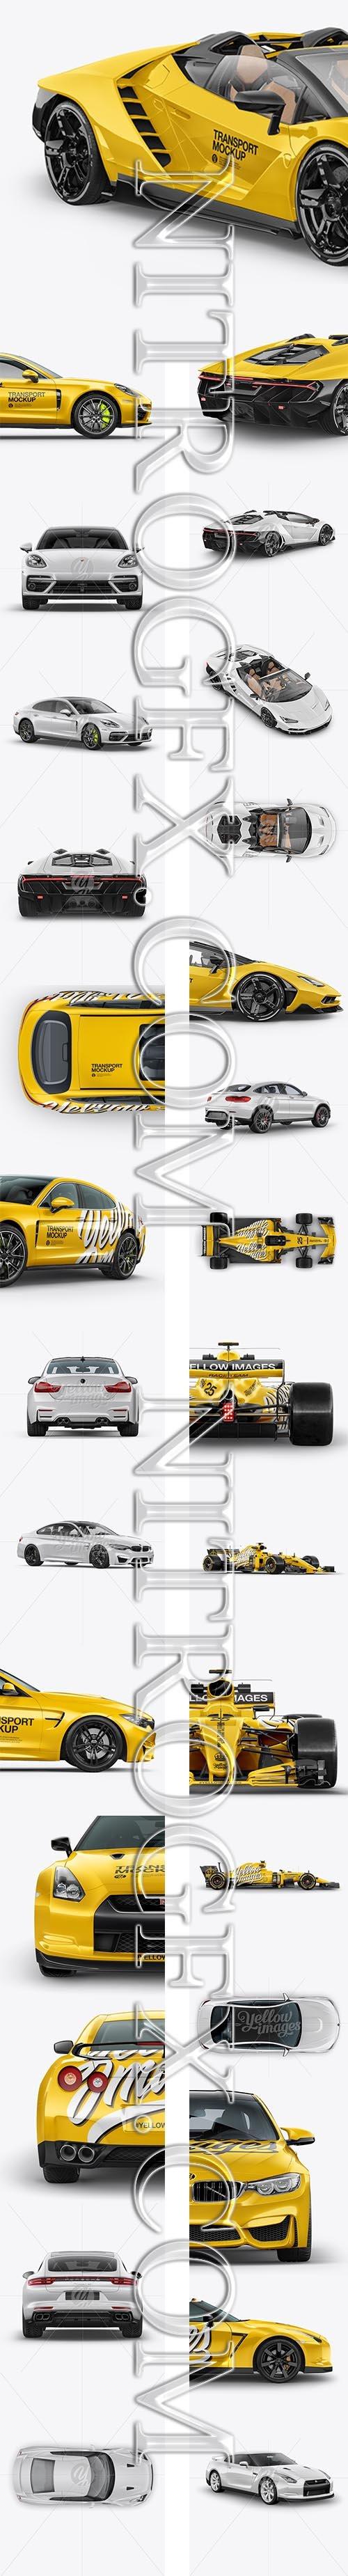 Big Pack with Cars Mockup Formula 1, BMW M4, Nissan GTR, Porsche Panamera 4 E-Hybrid, Coupe Crossover SUV Mockup